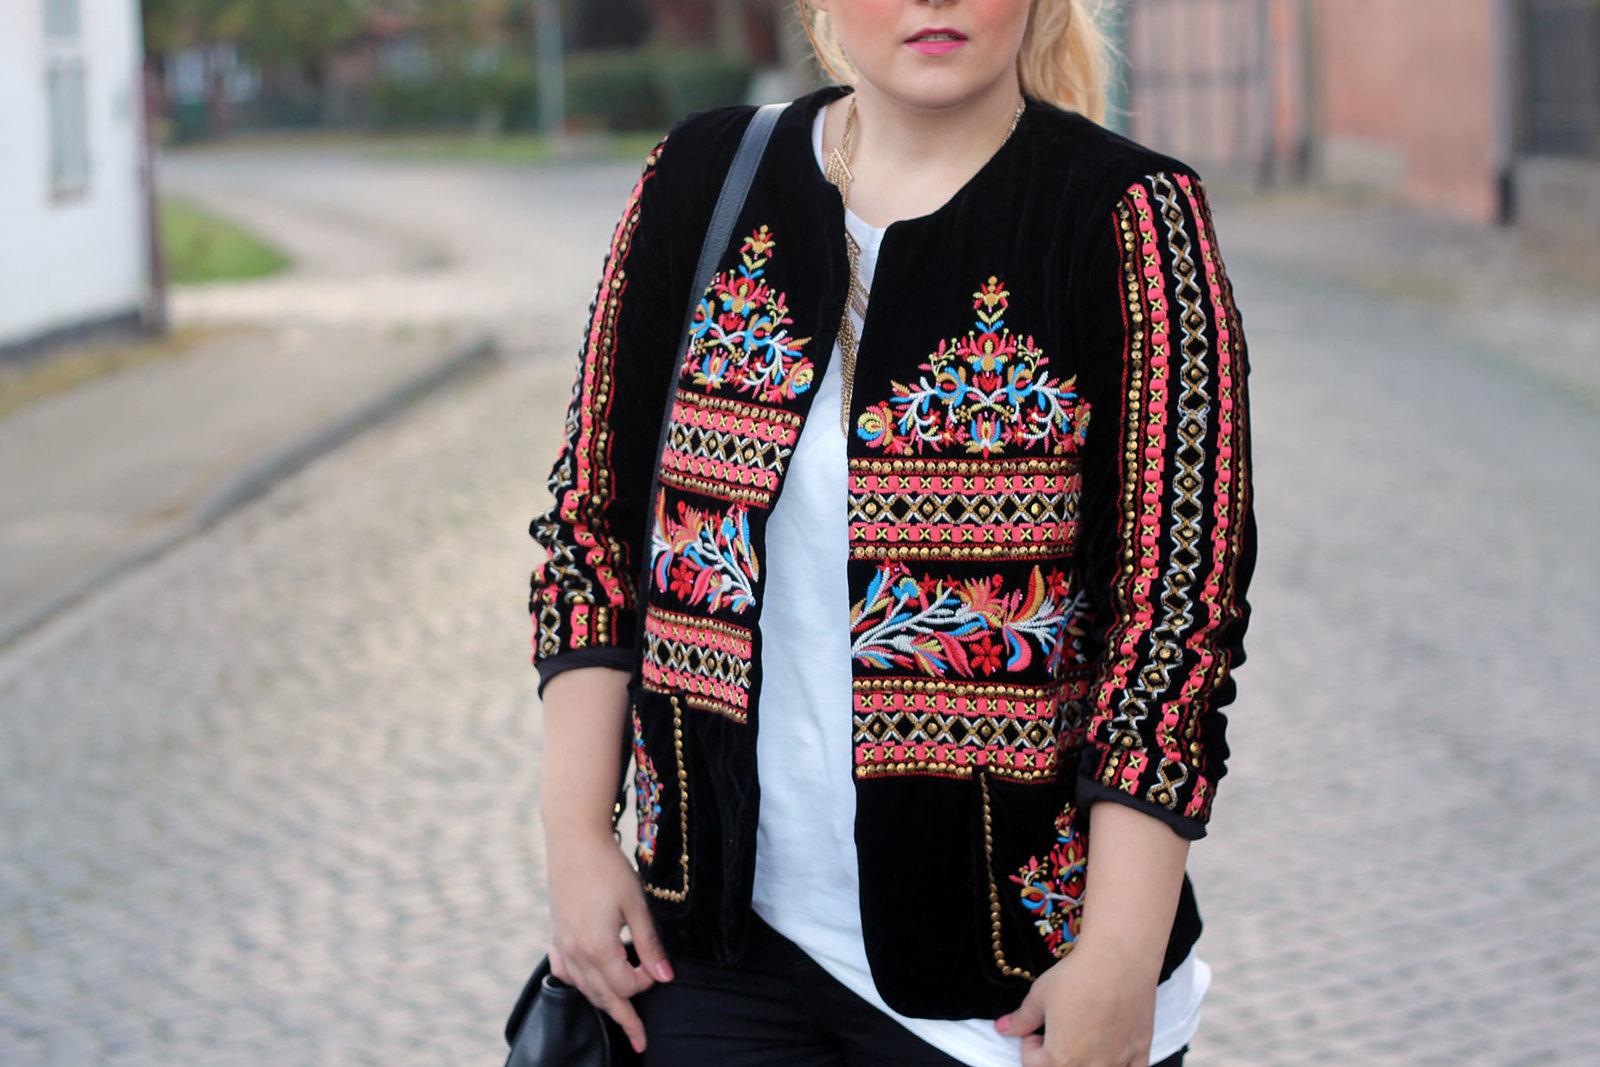 boho-jacke-trend-style-modeblog-fashionblog-blogger-berlin